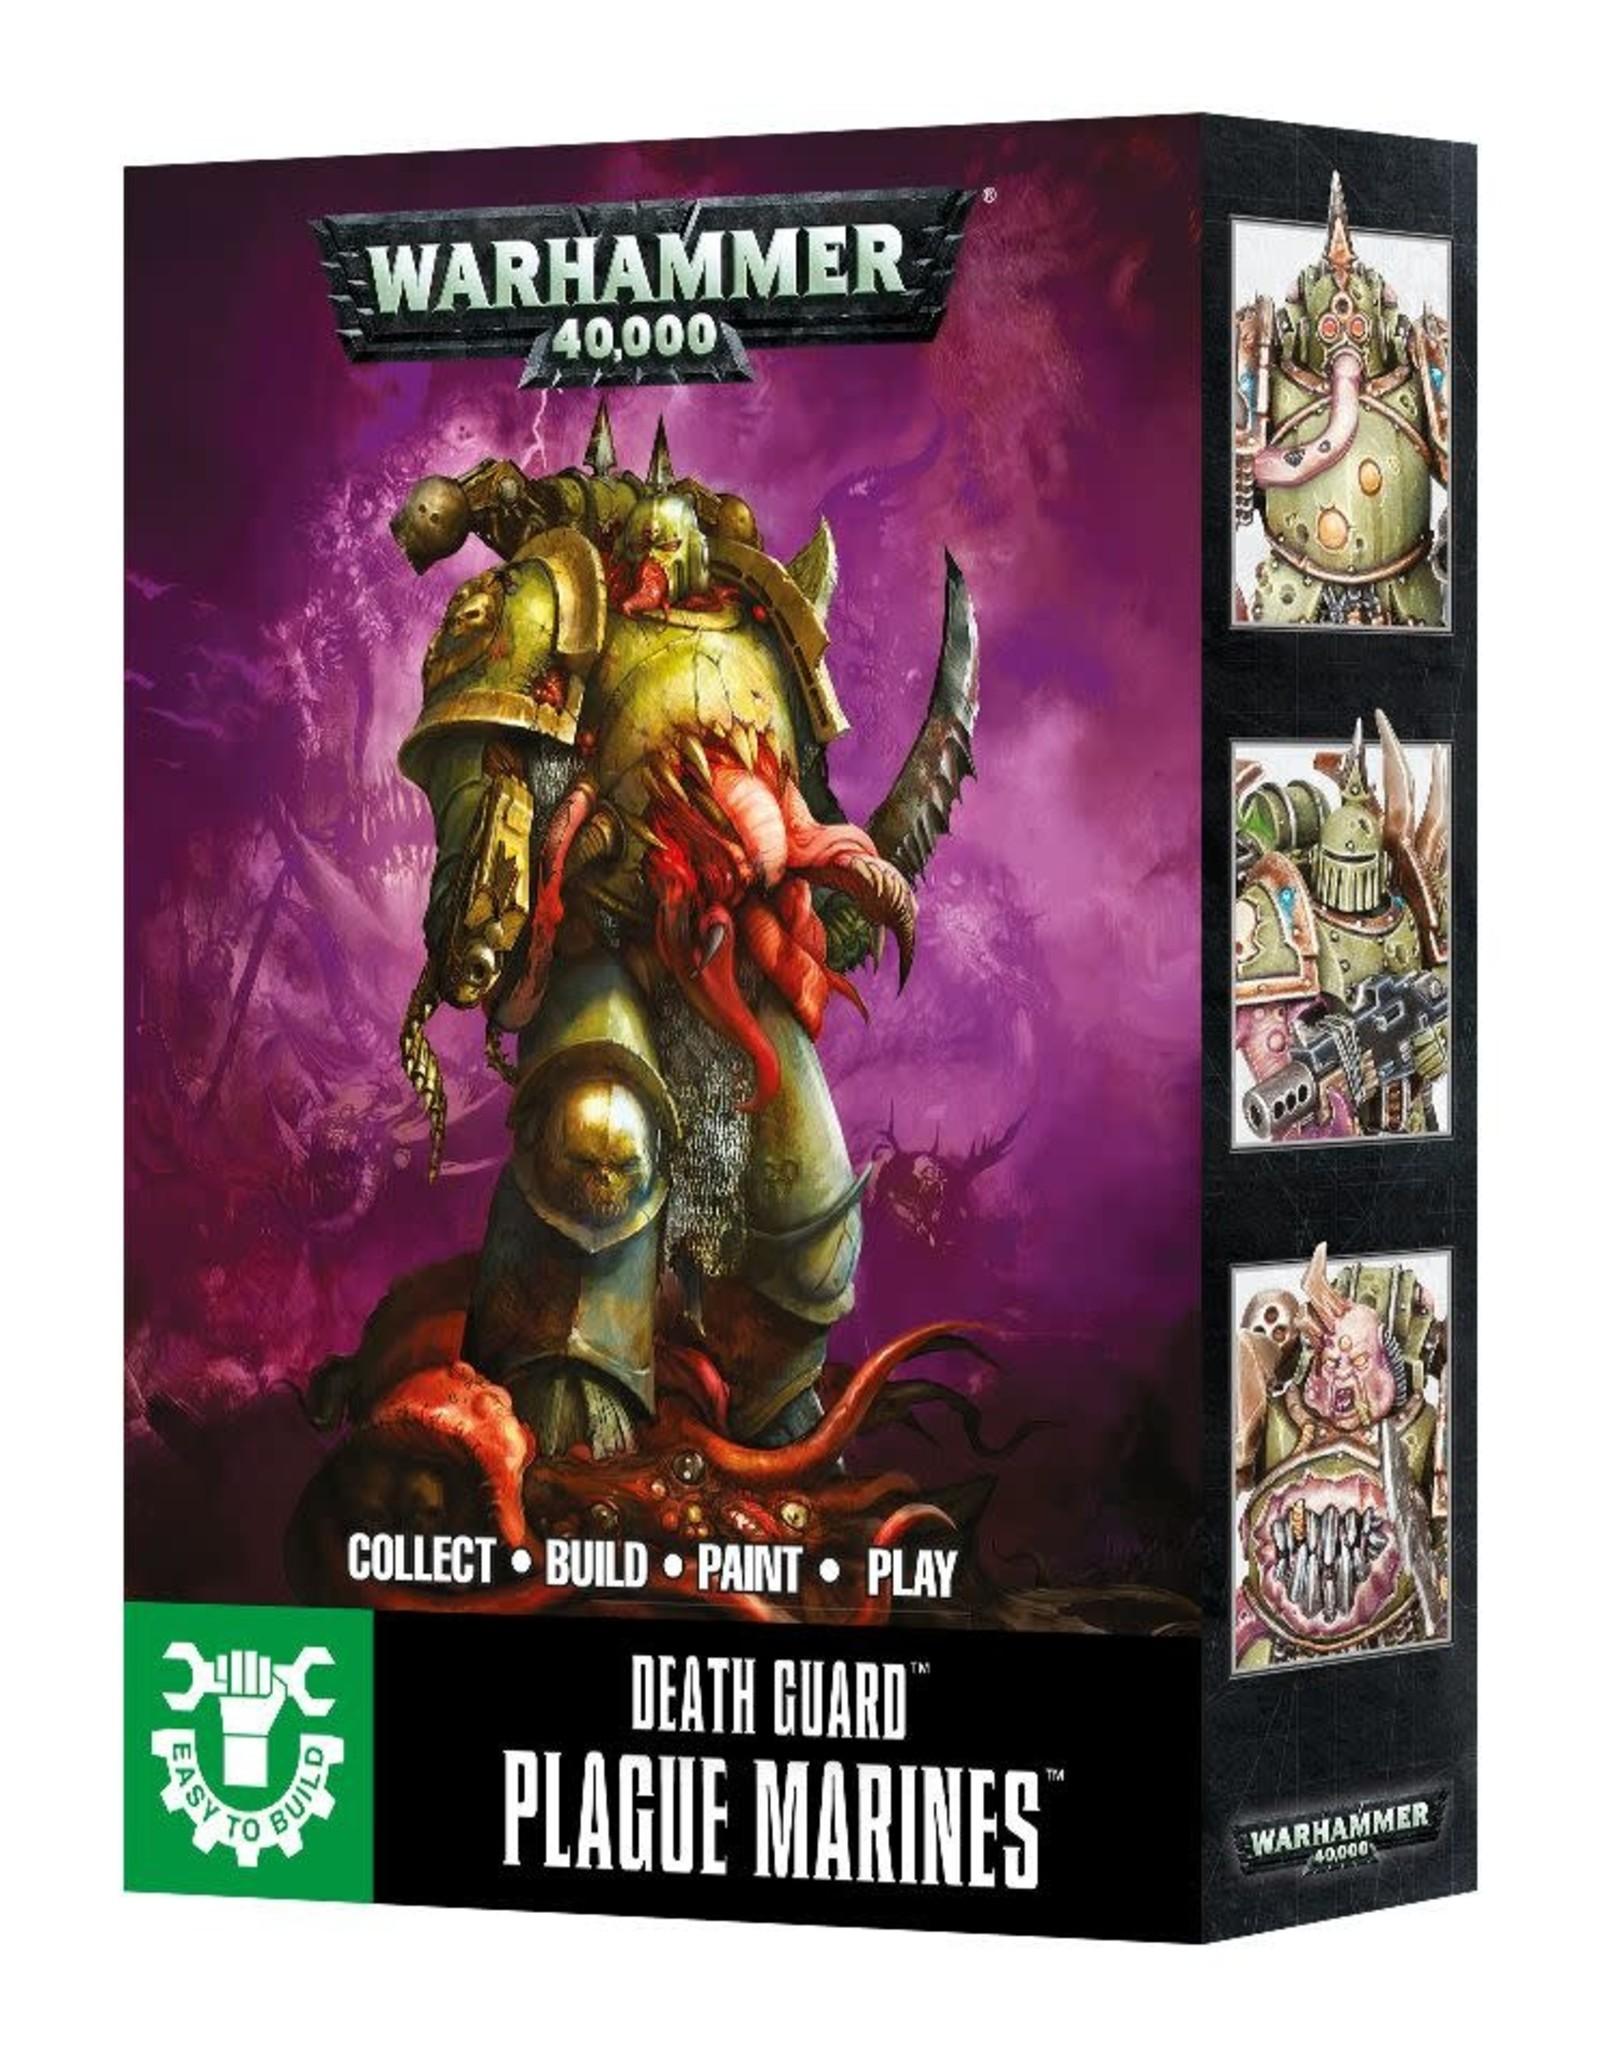 Warhammer 40K ETB: Death Guard Plague Marines